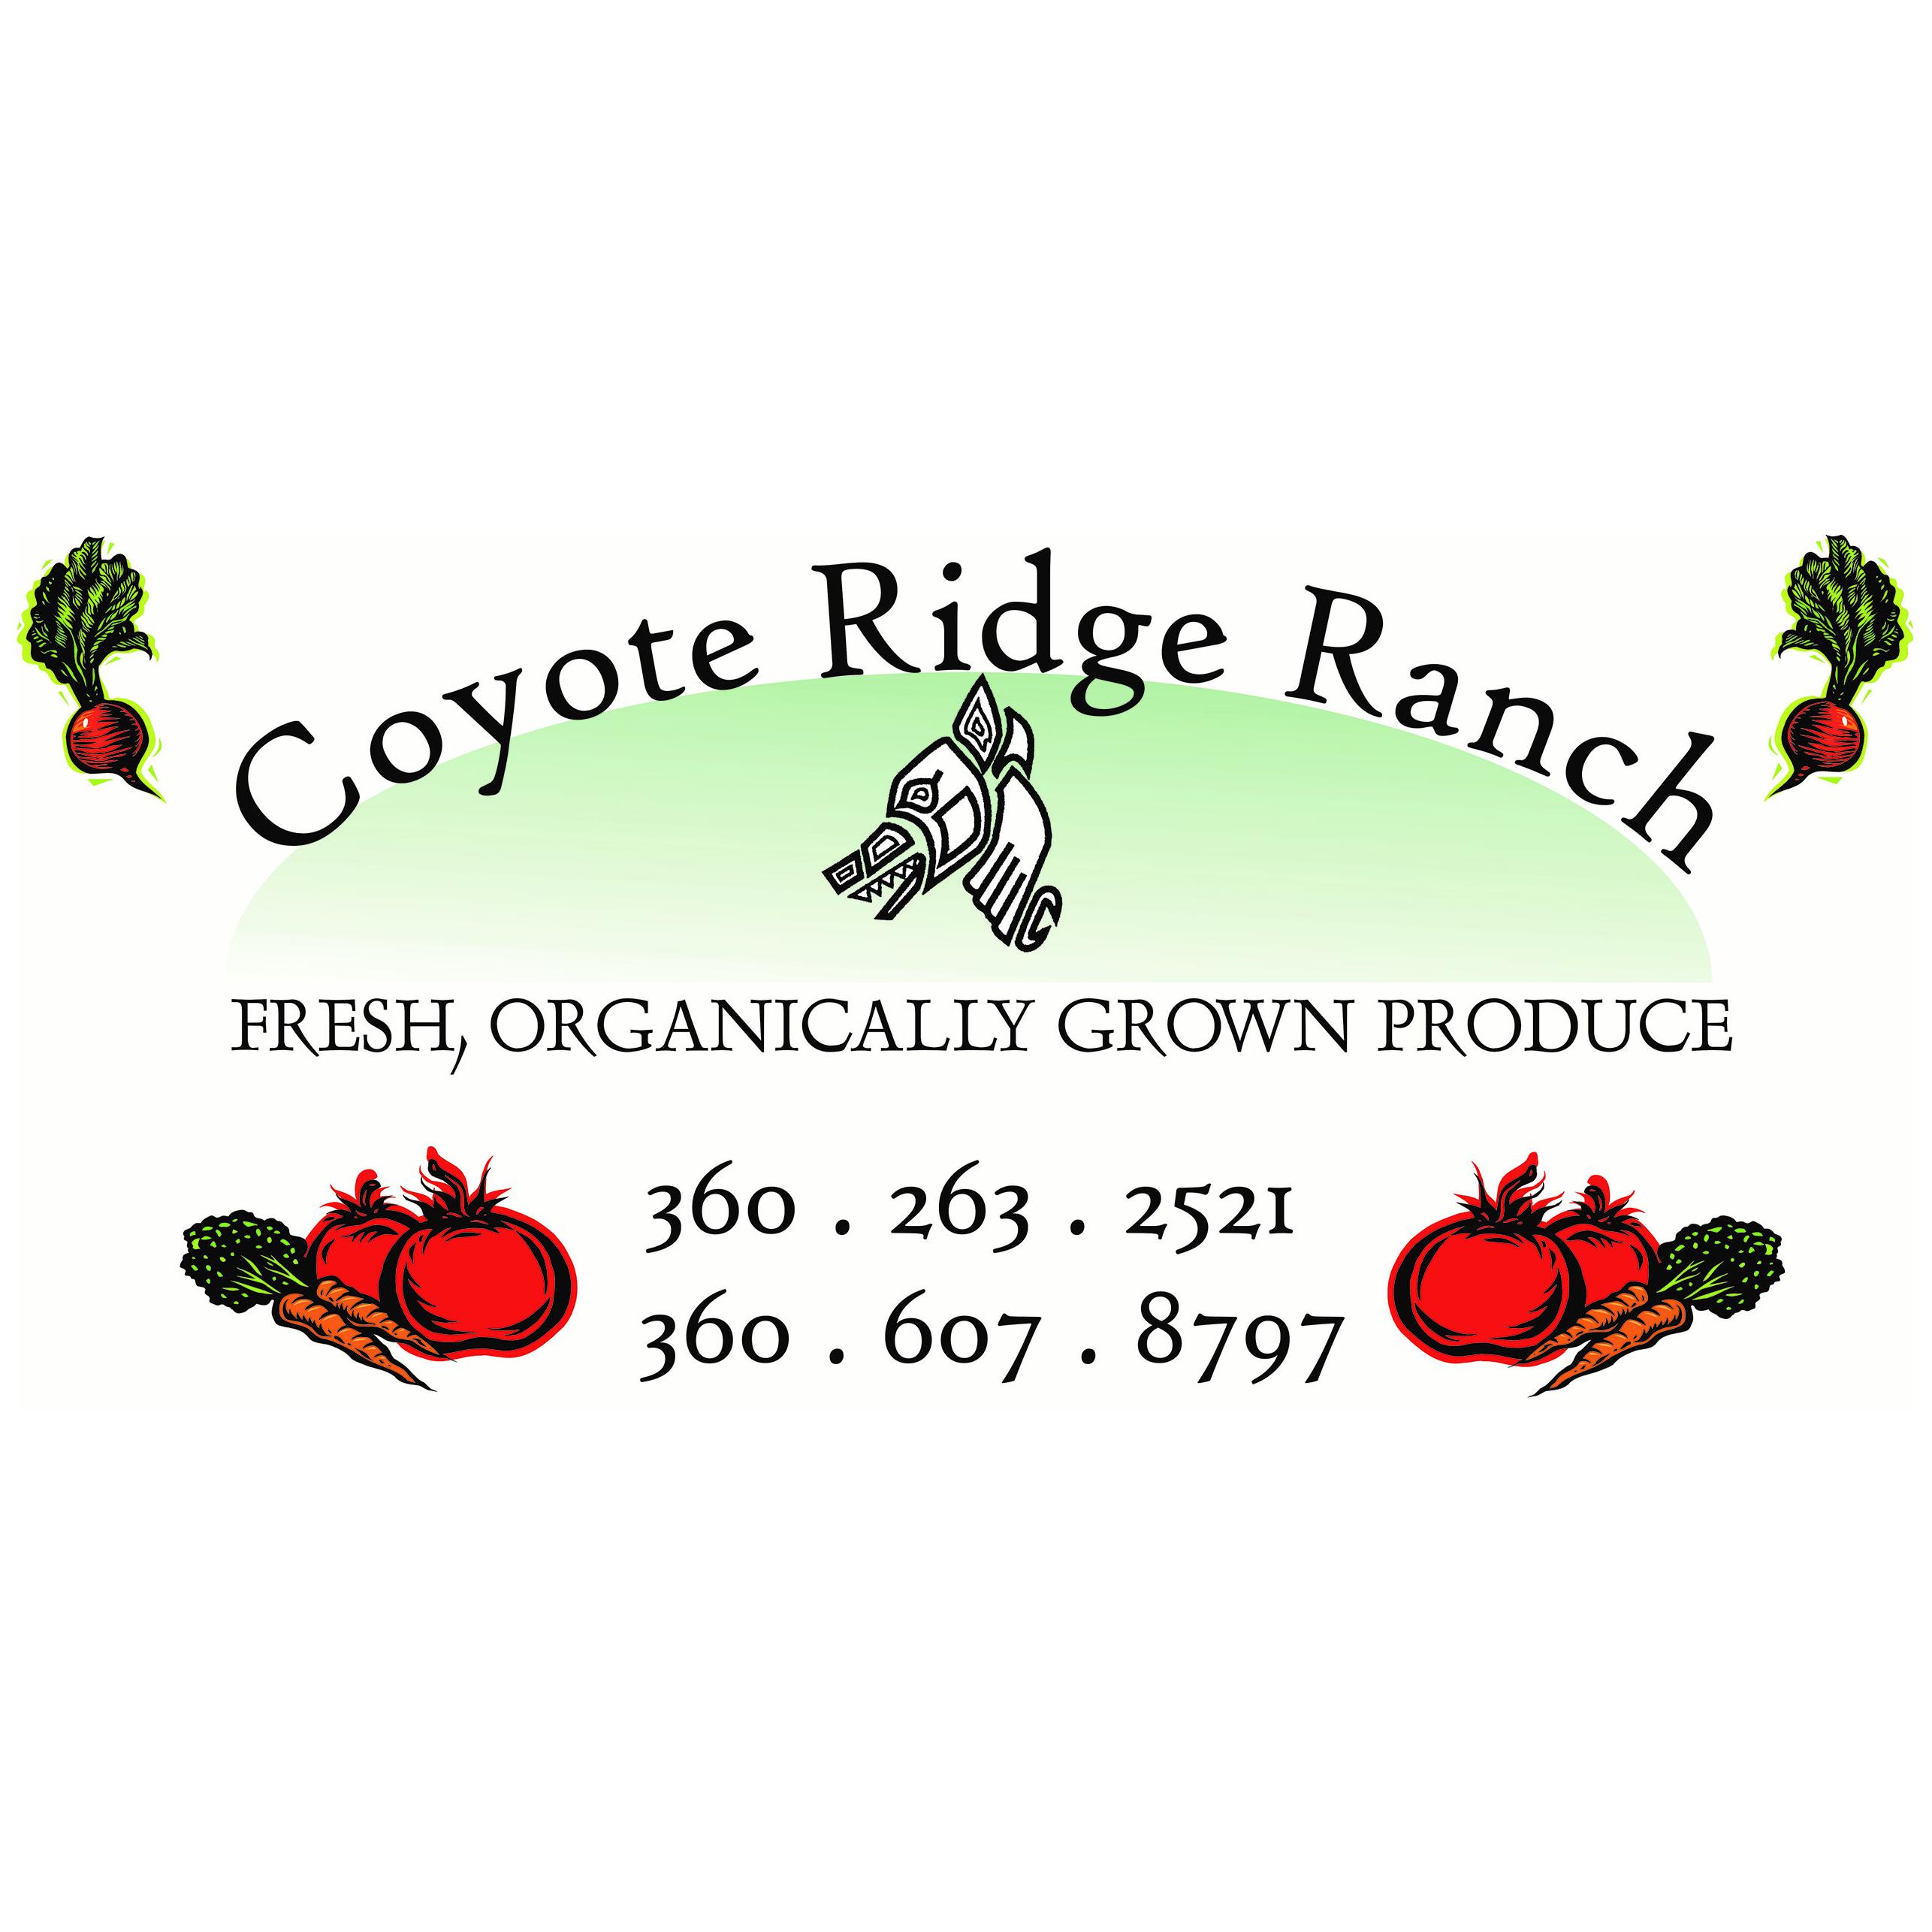 Coyote Ridge Ranch